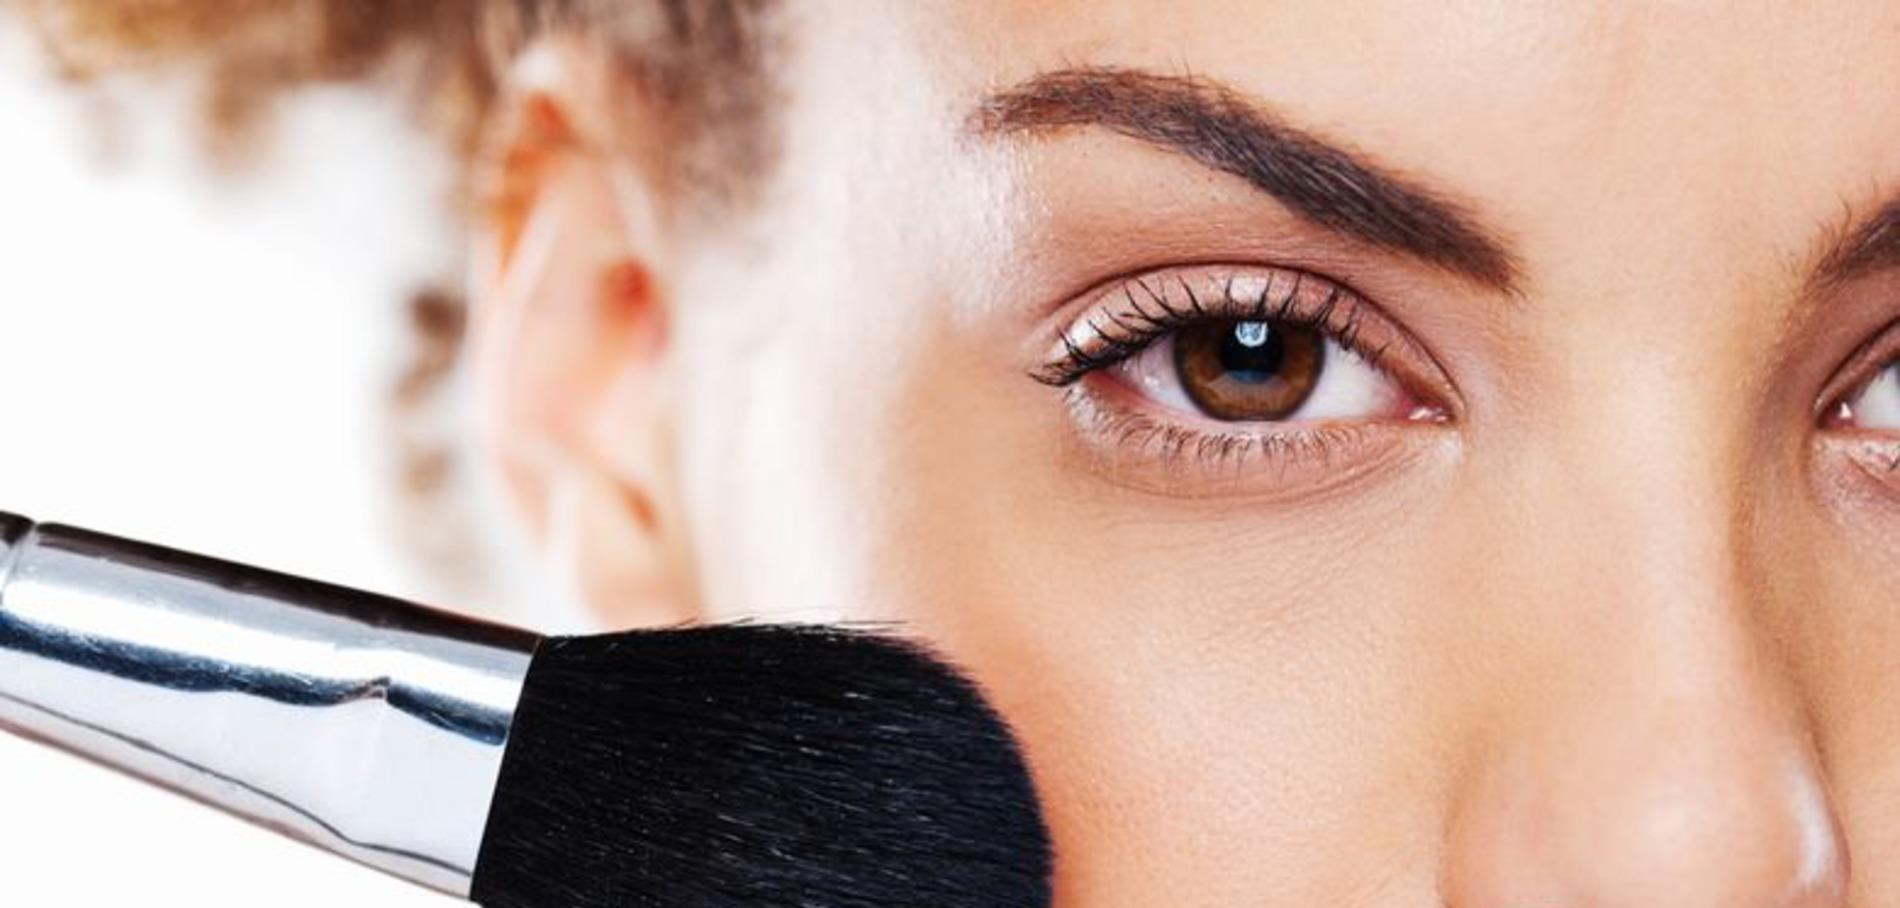 maquillage bio et minéral